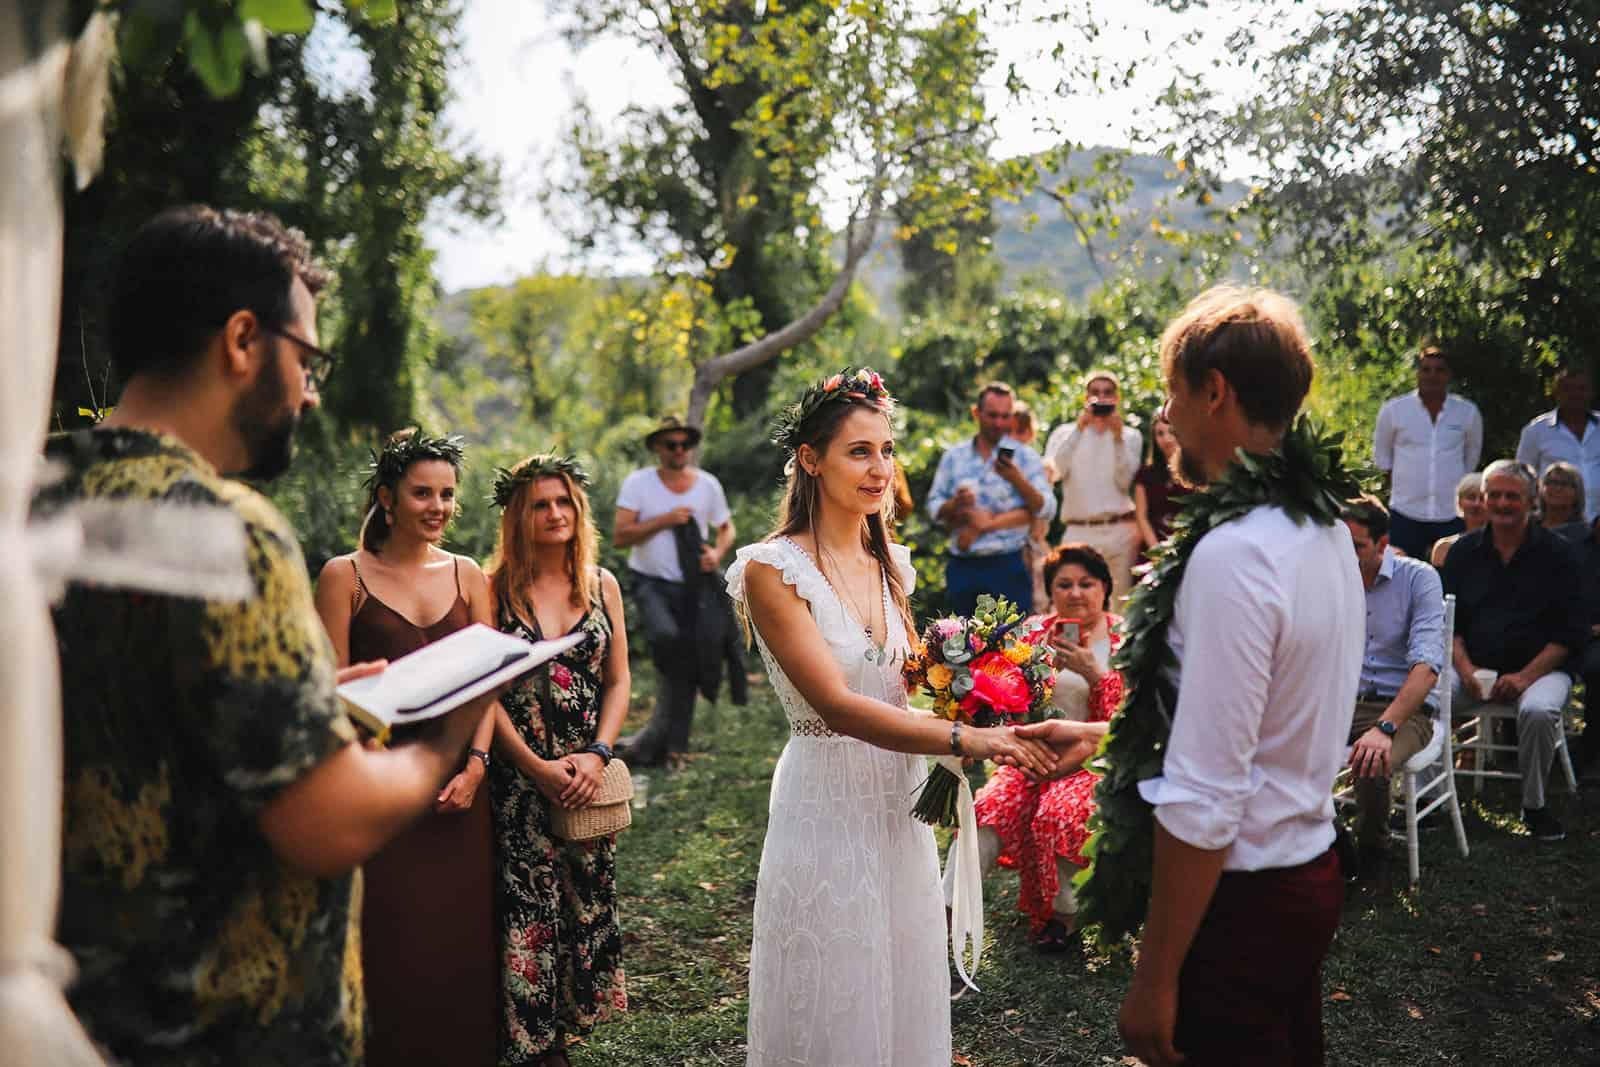 IMG 0929 websize | Croatia Elopement Photographer and Videographer